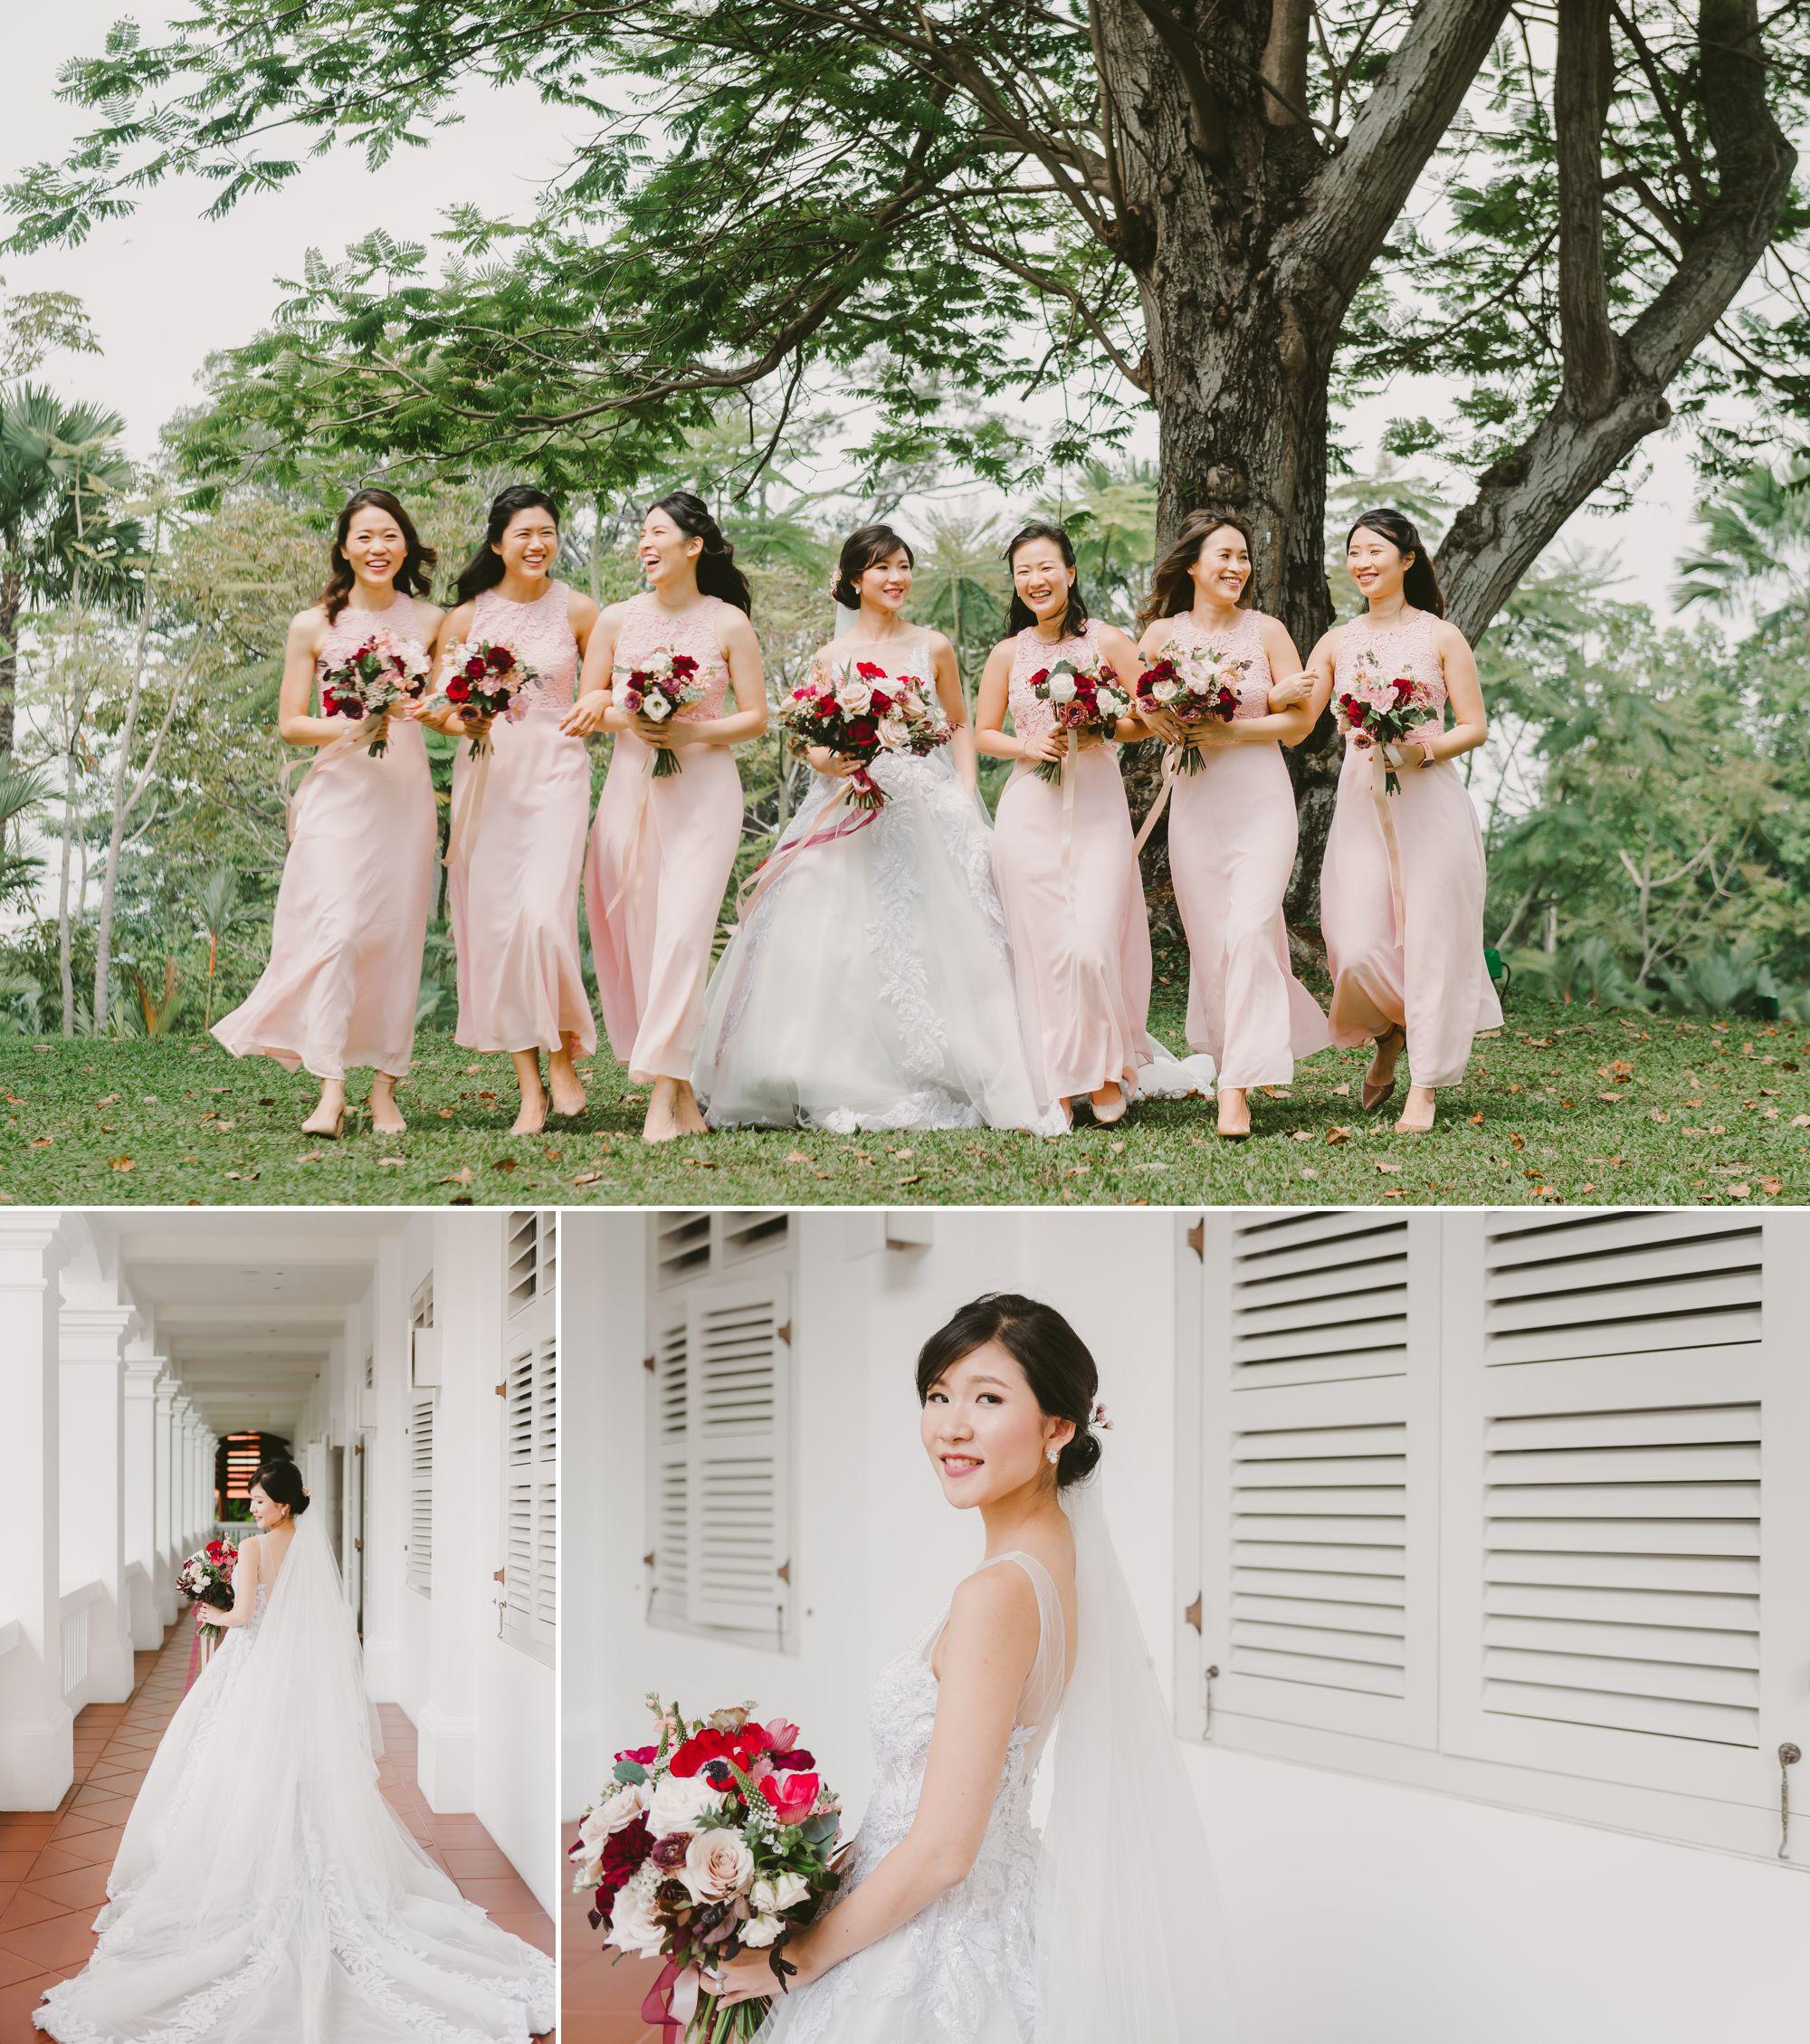 capella_wedding_photography_ 24.jpg